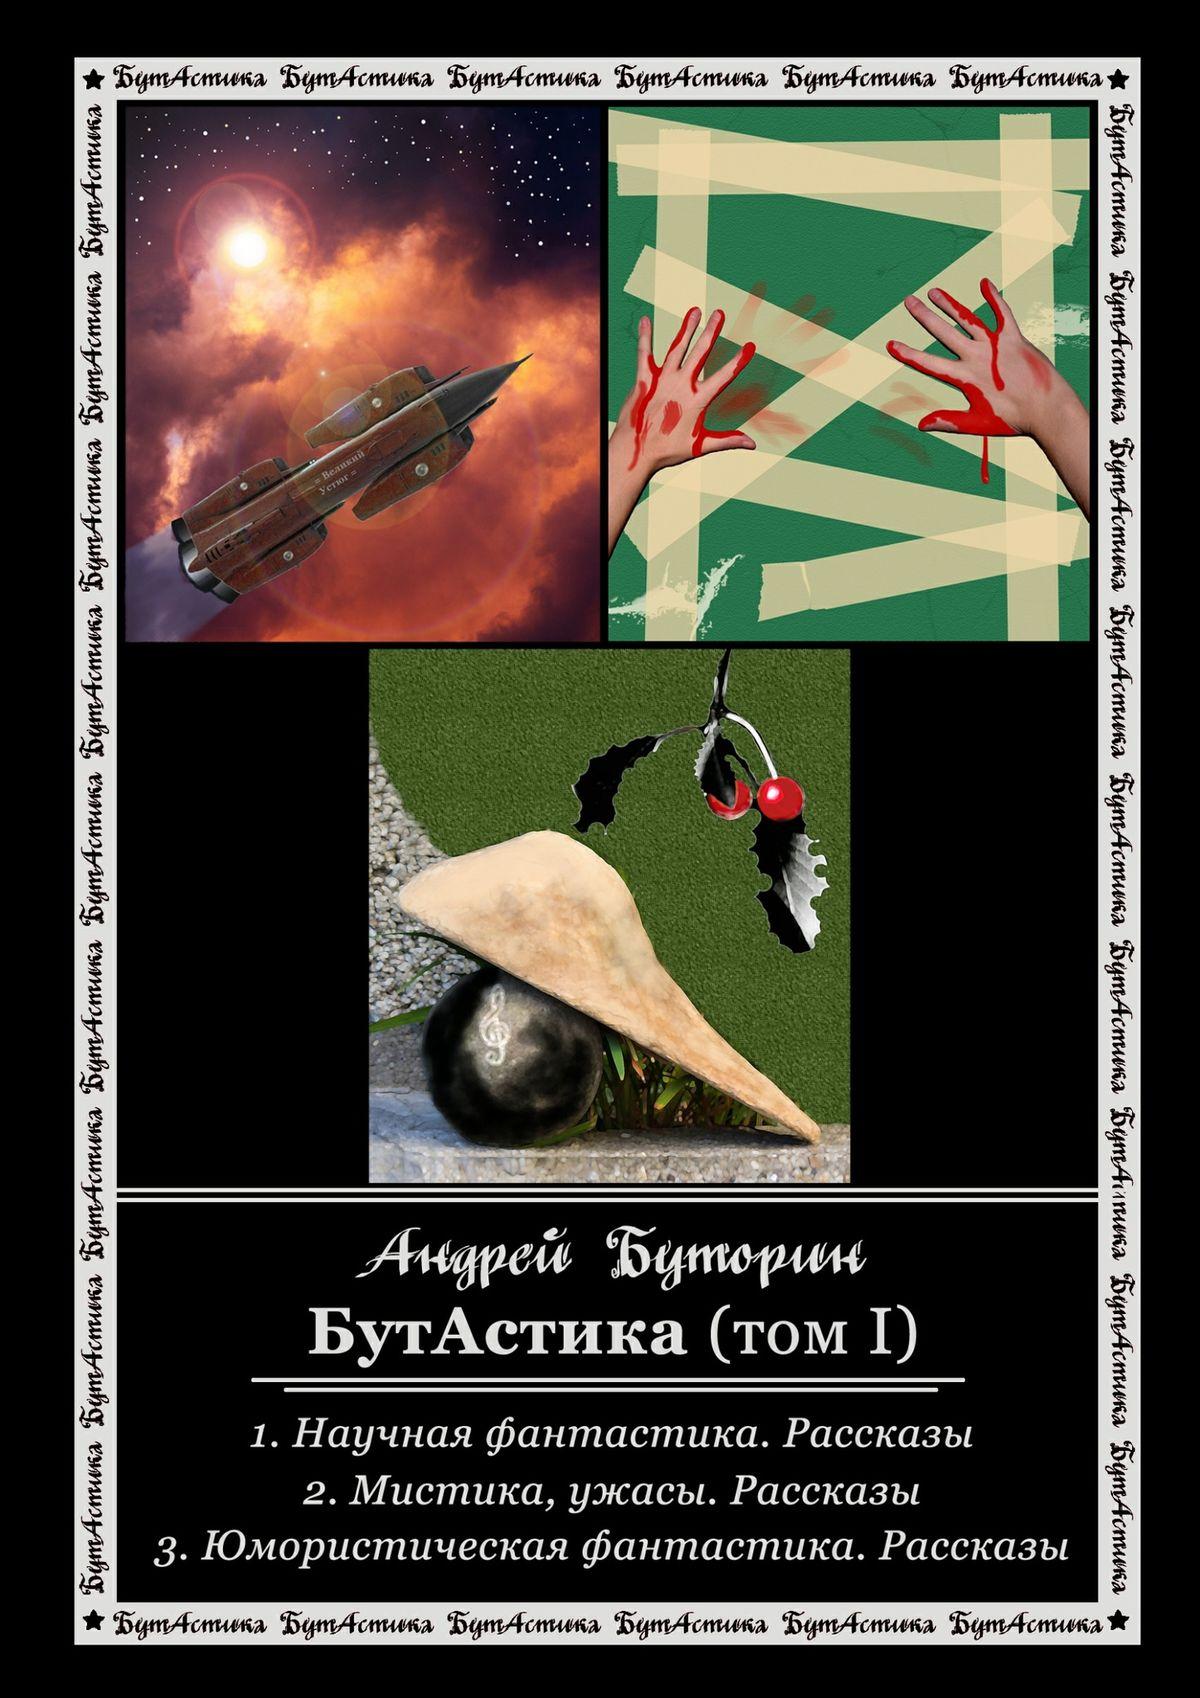 цена на Андрей Буторин БутАстика (томI)